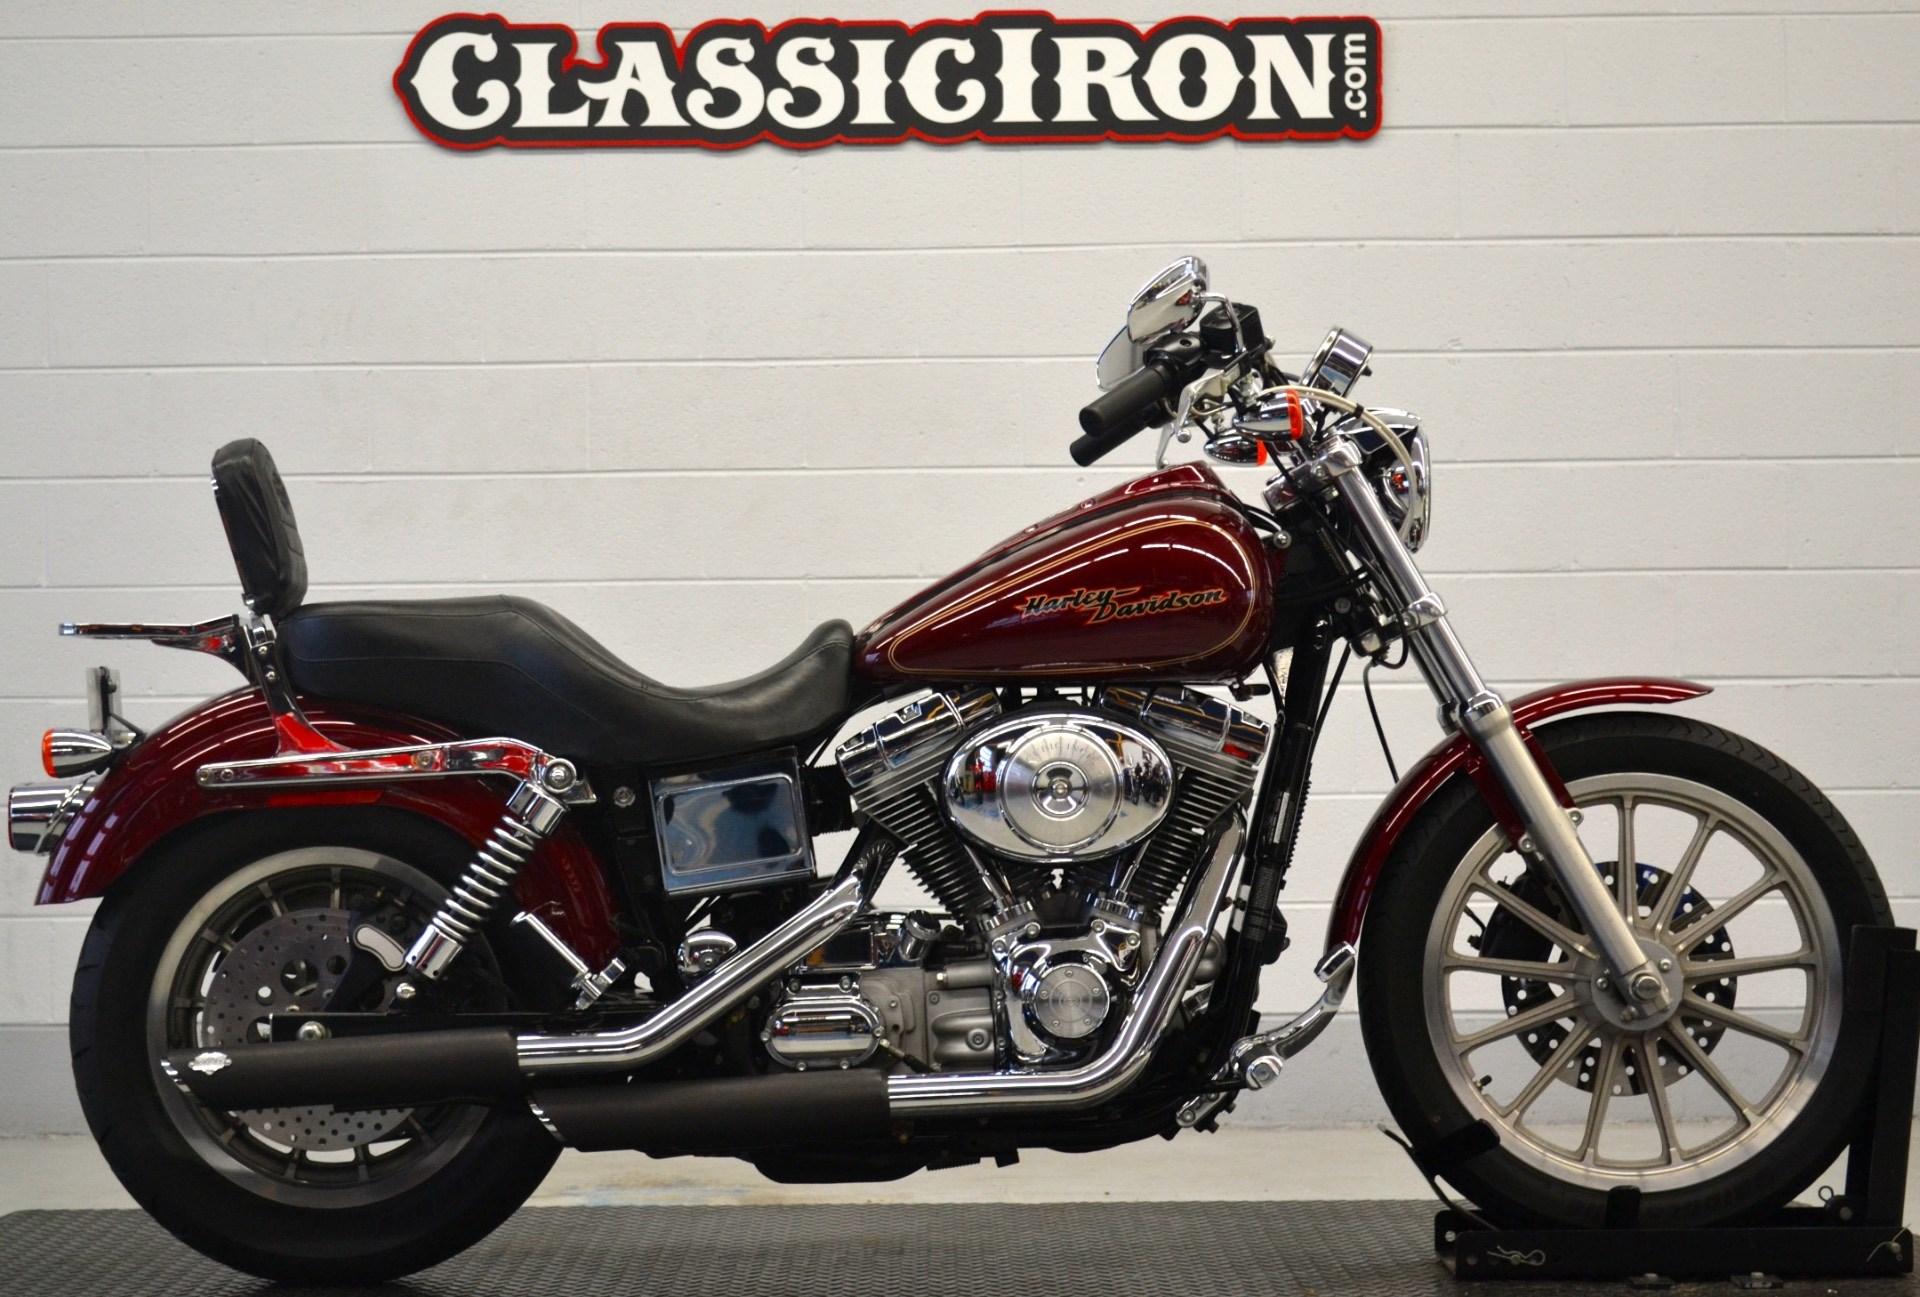 Used 2008 Harley Davidson Fxdc Dyna Super Glide Custom For: All New & Used Harley-Davidson® Dyna Super Glide Custom